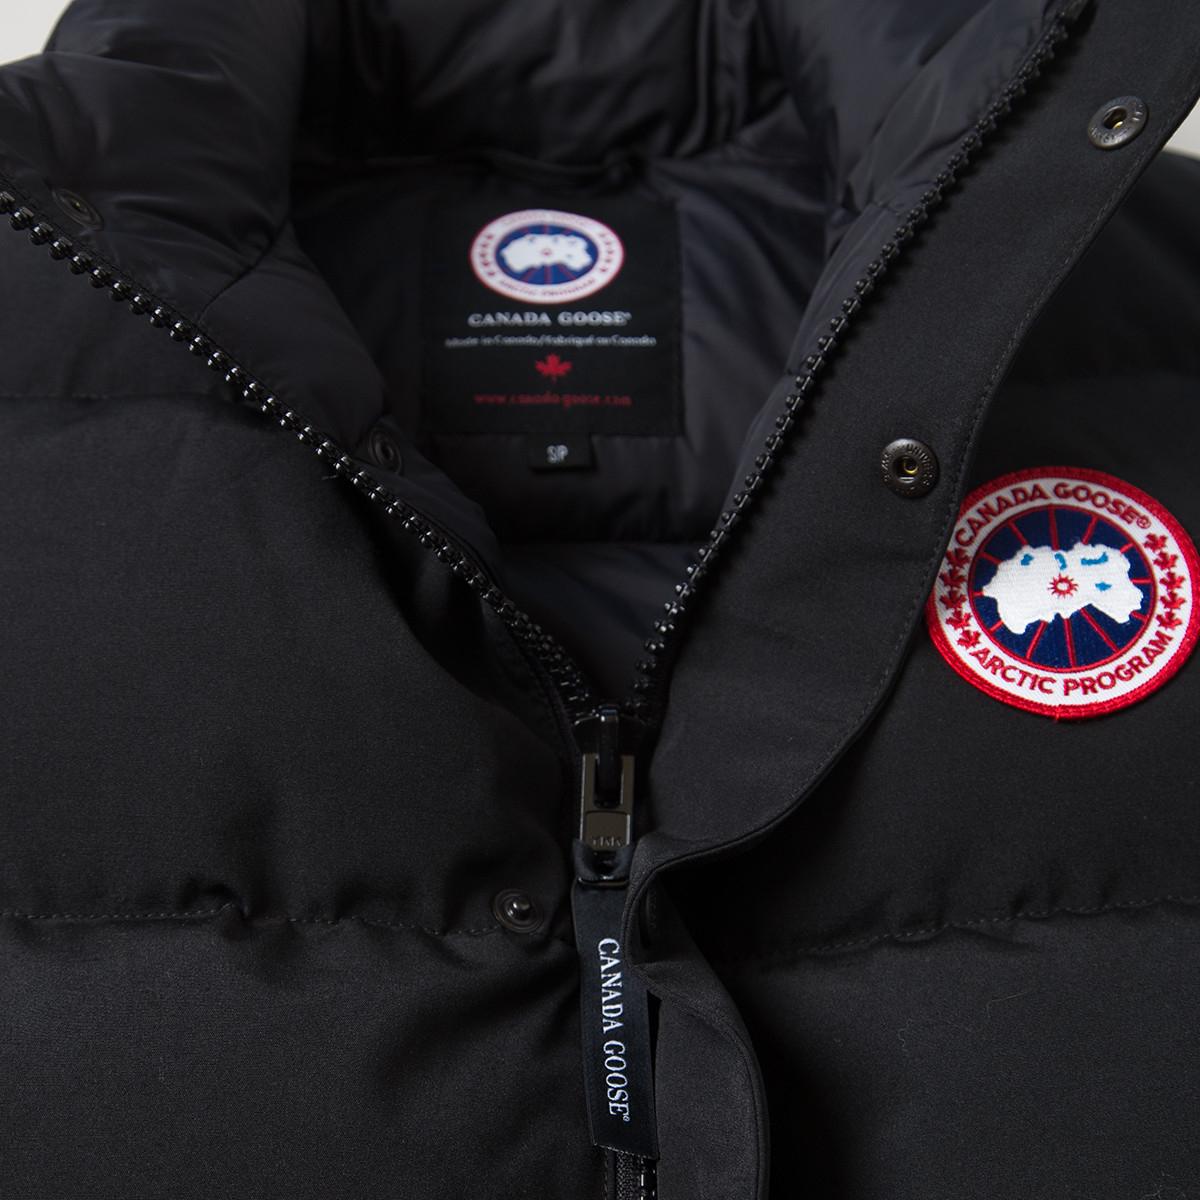 Canada Goose vest sale shop - Canada goose Freestyle Vest in Black for Men | Lyst